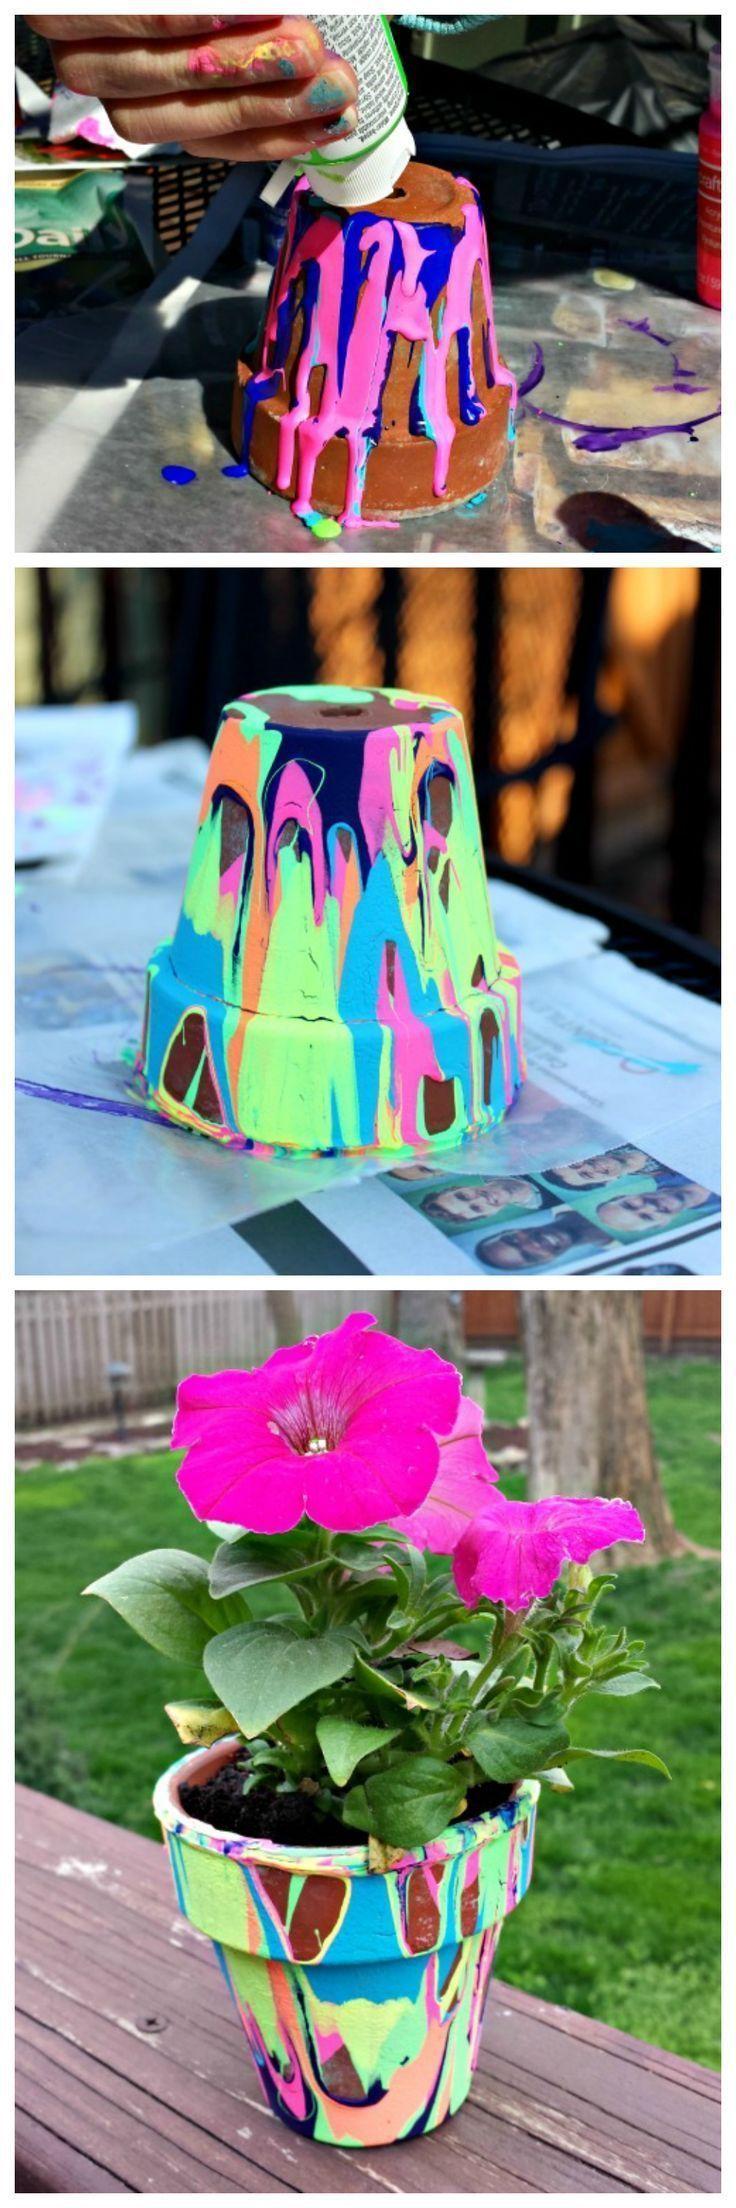 Homemade garden art ideas - Homemade Garden Art Ideas 33